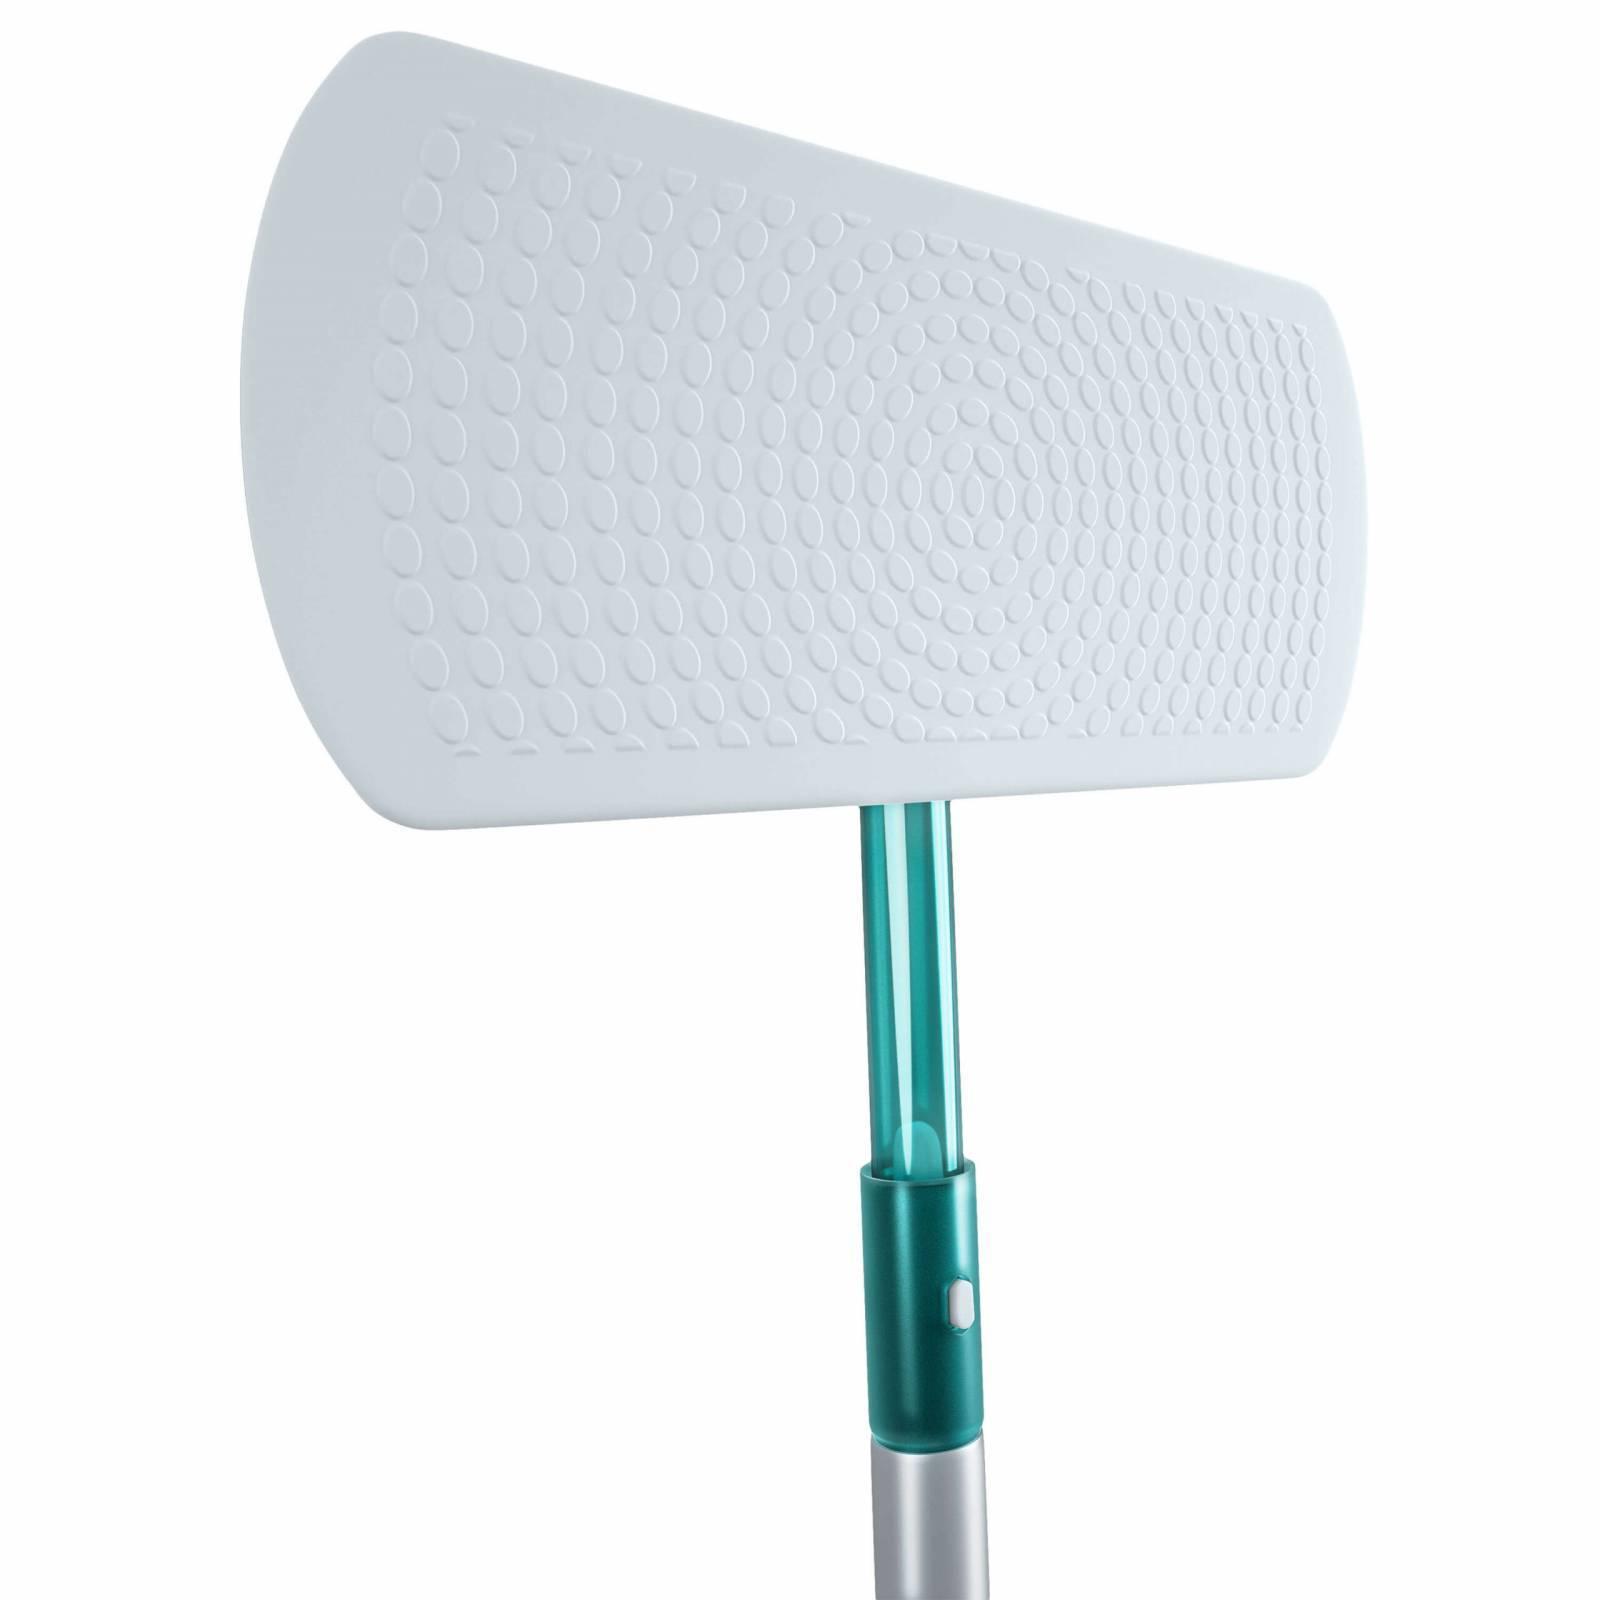 Mop Easy Floor Tirar Pó Limpeza 5 Refis Eletrostáticos Flash - LCGELETRO